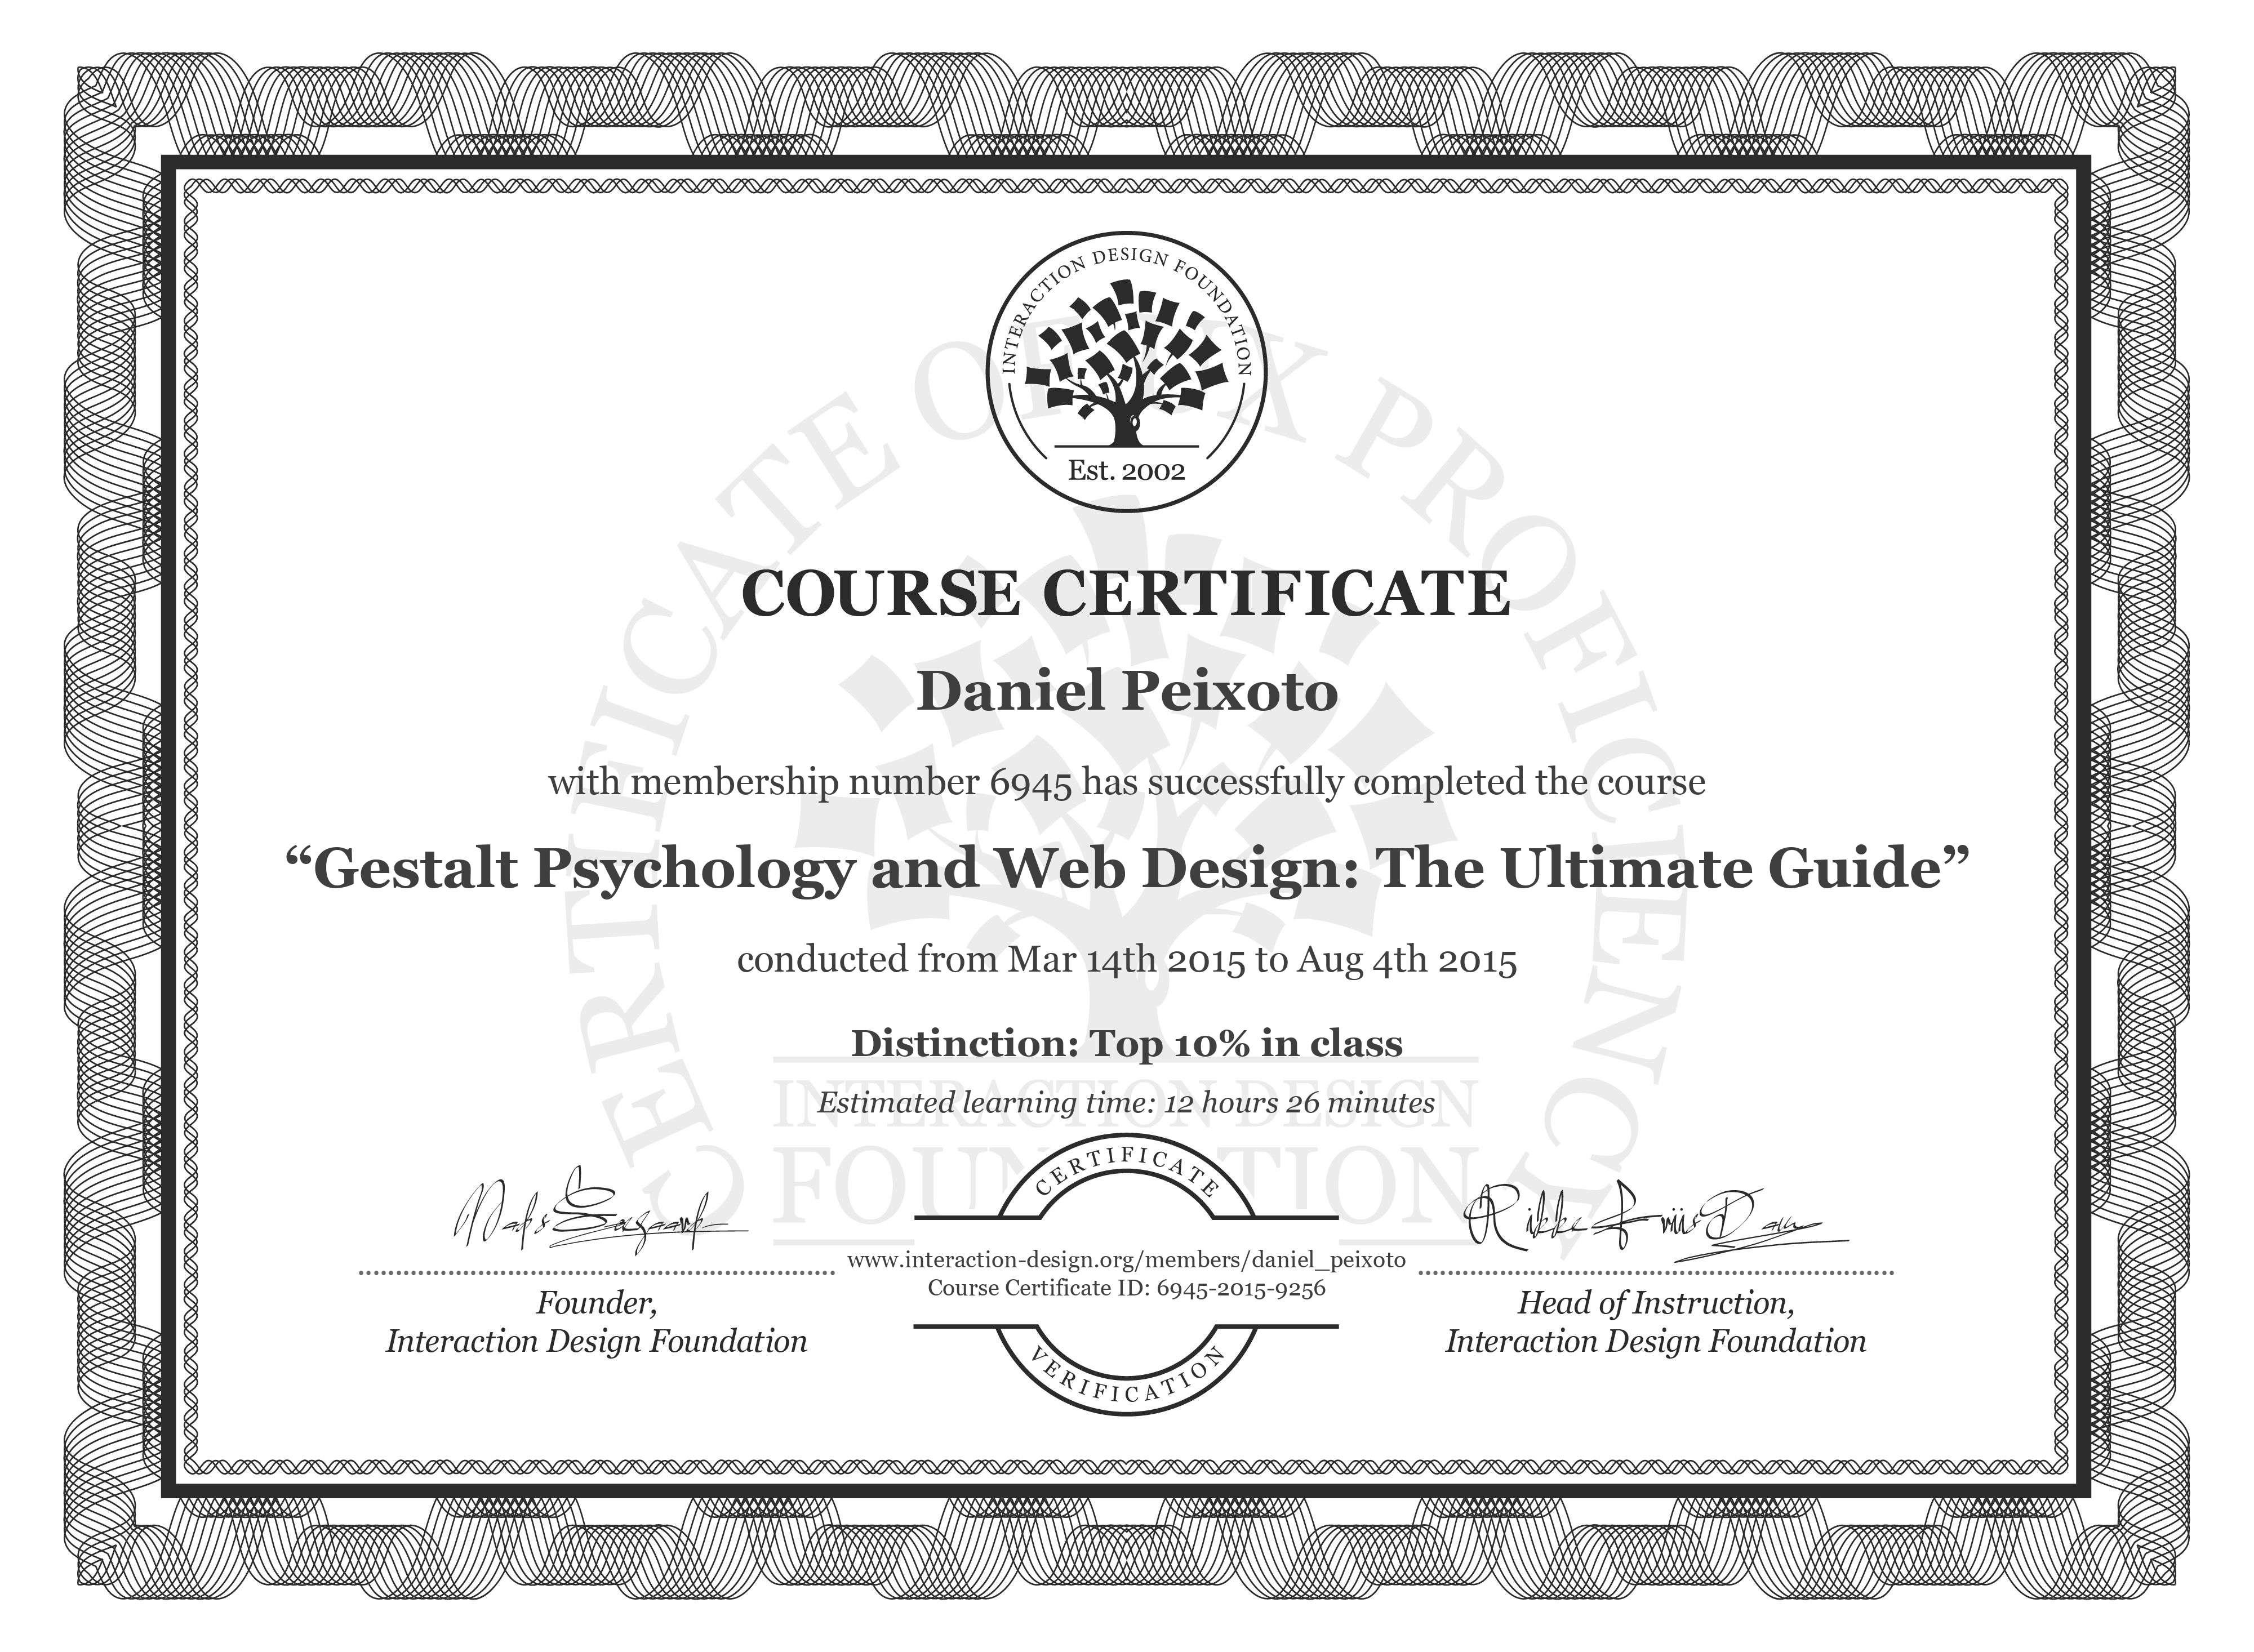 Daniel Peixoto: Course Certificate - Gestalt Psychology and Web Design: The Ultimate Guide